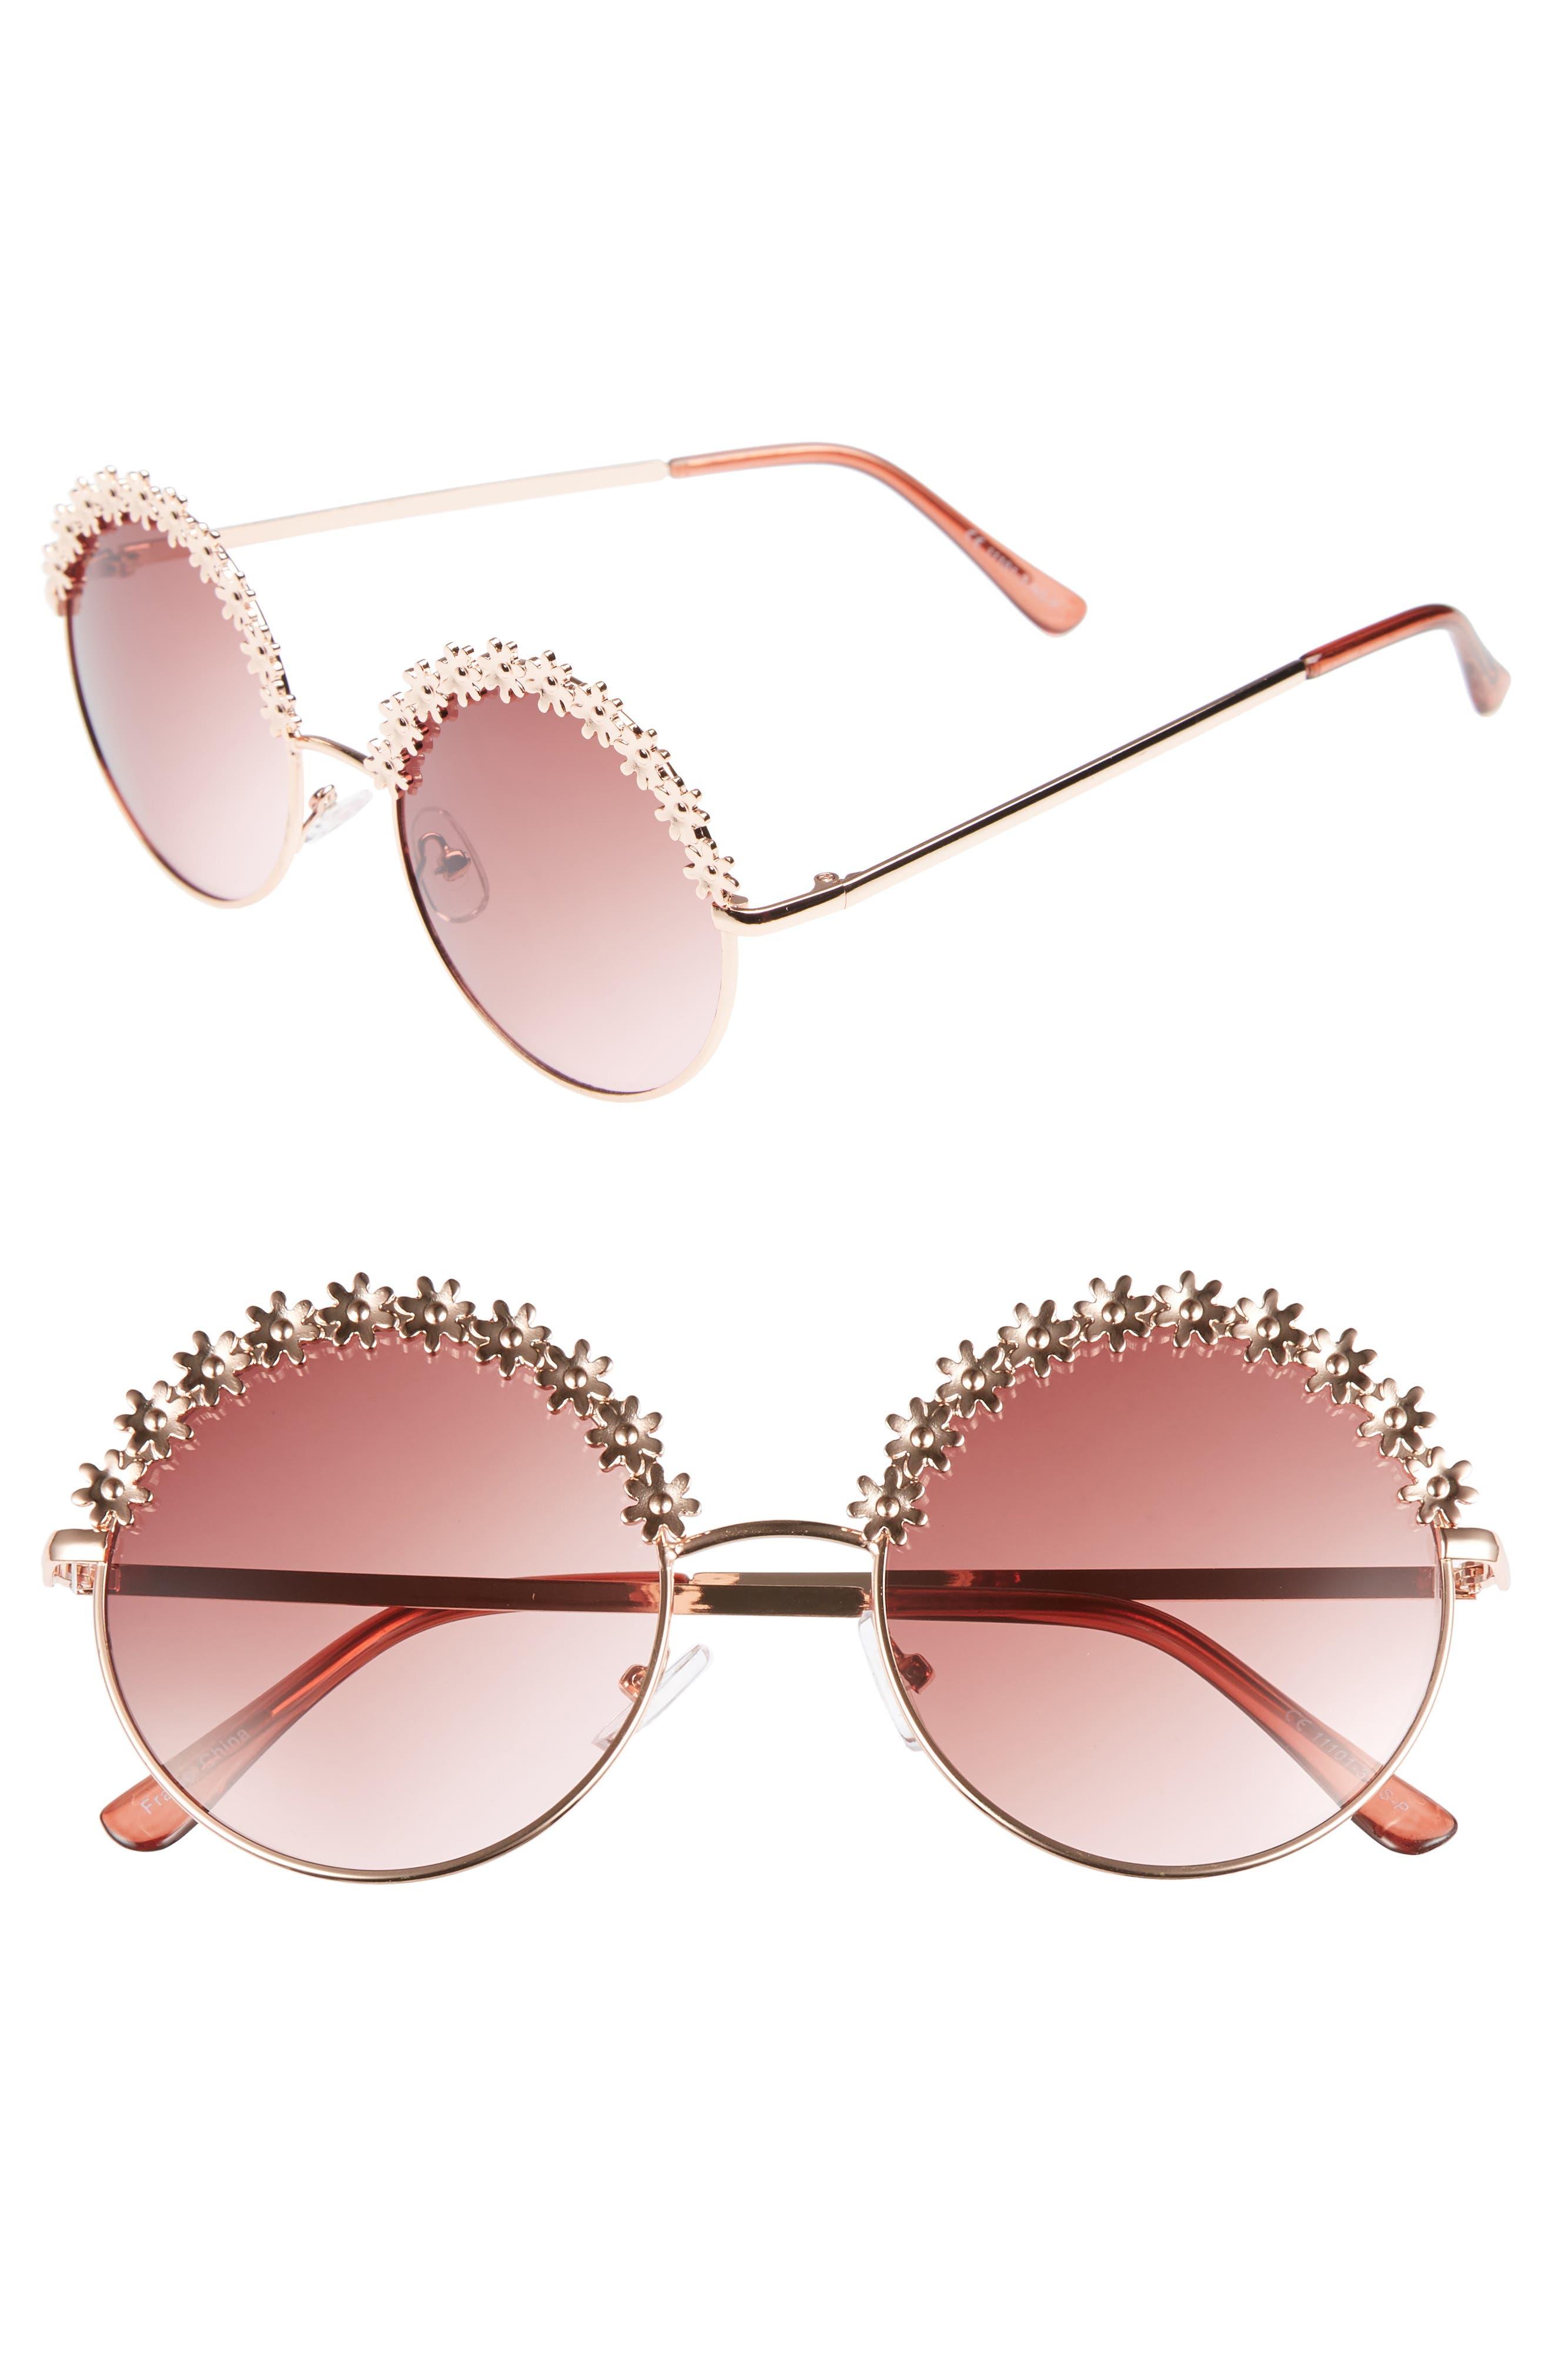 52mm Flower Trim Round Sunglasses,                             Main thumbnail 1, color,                             Gold